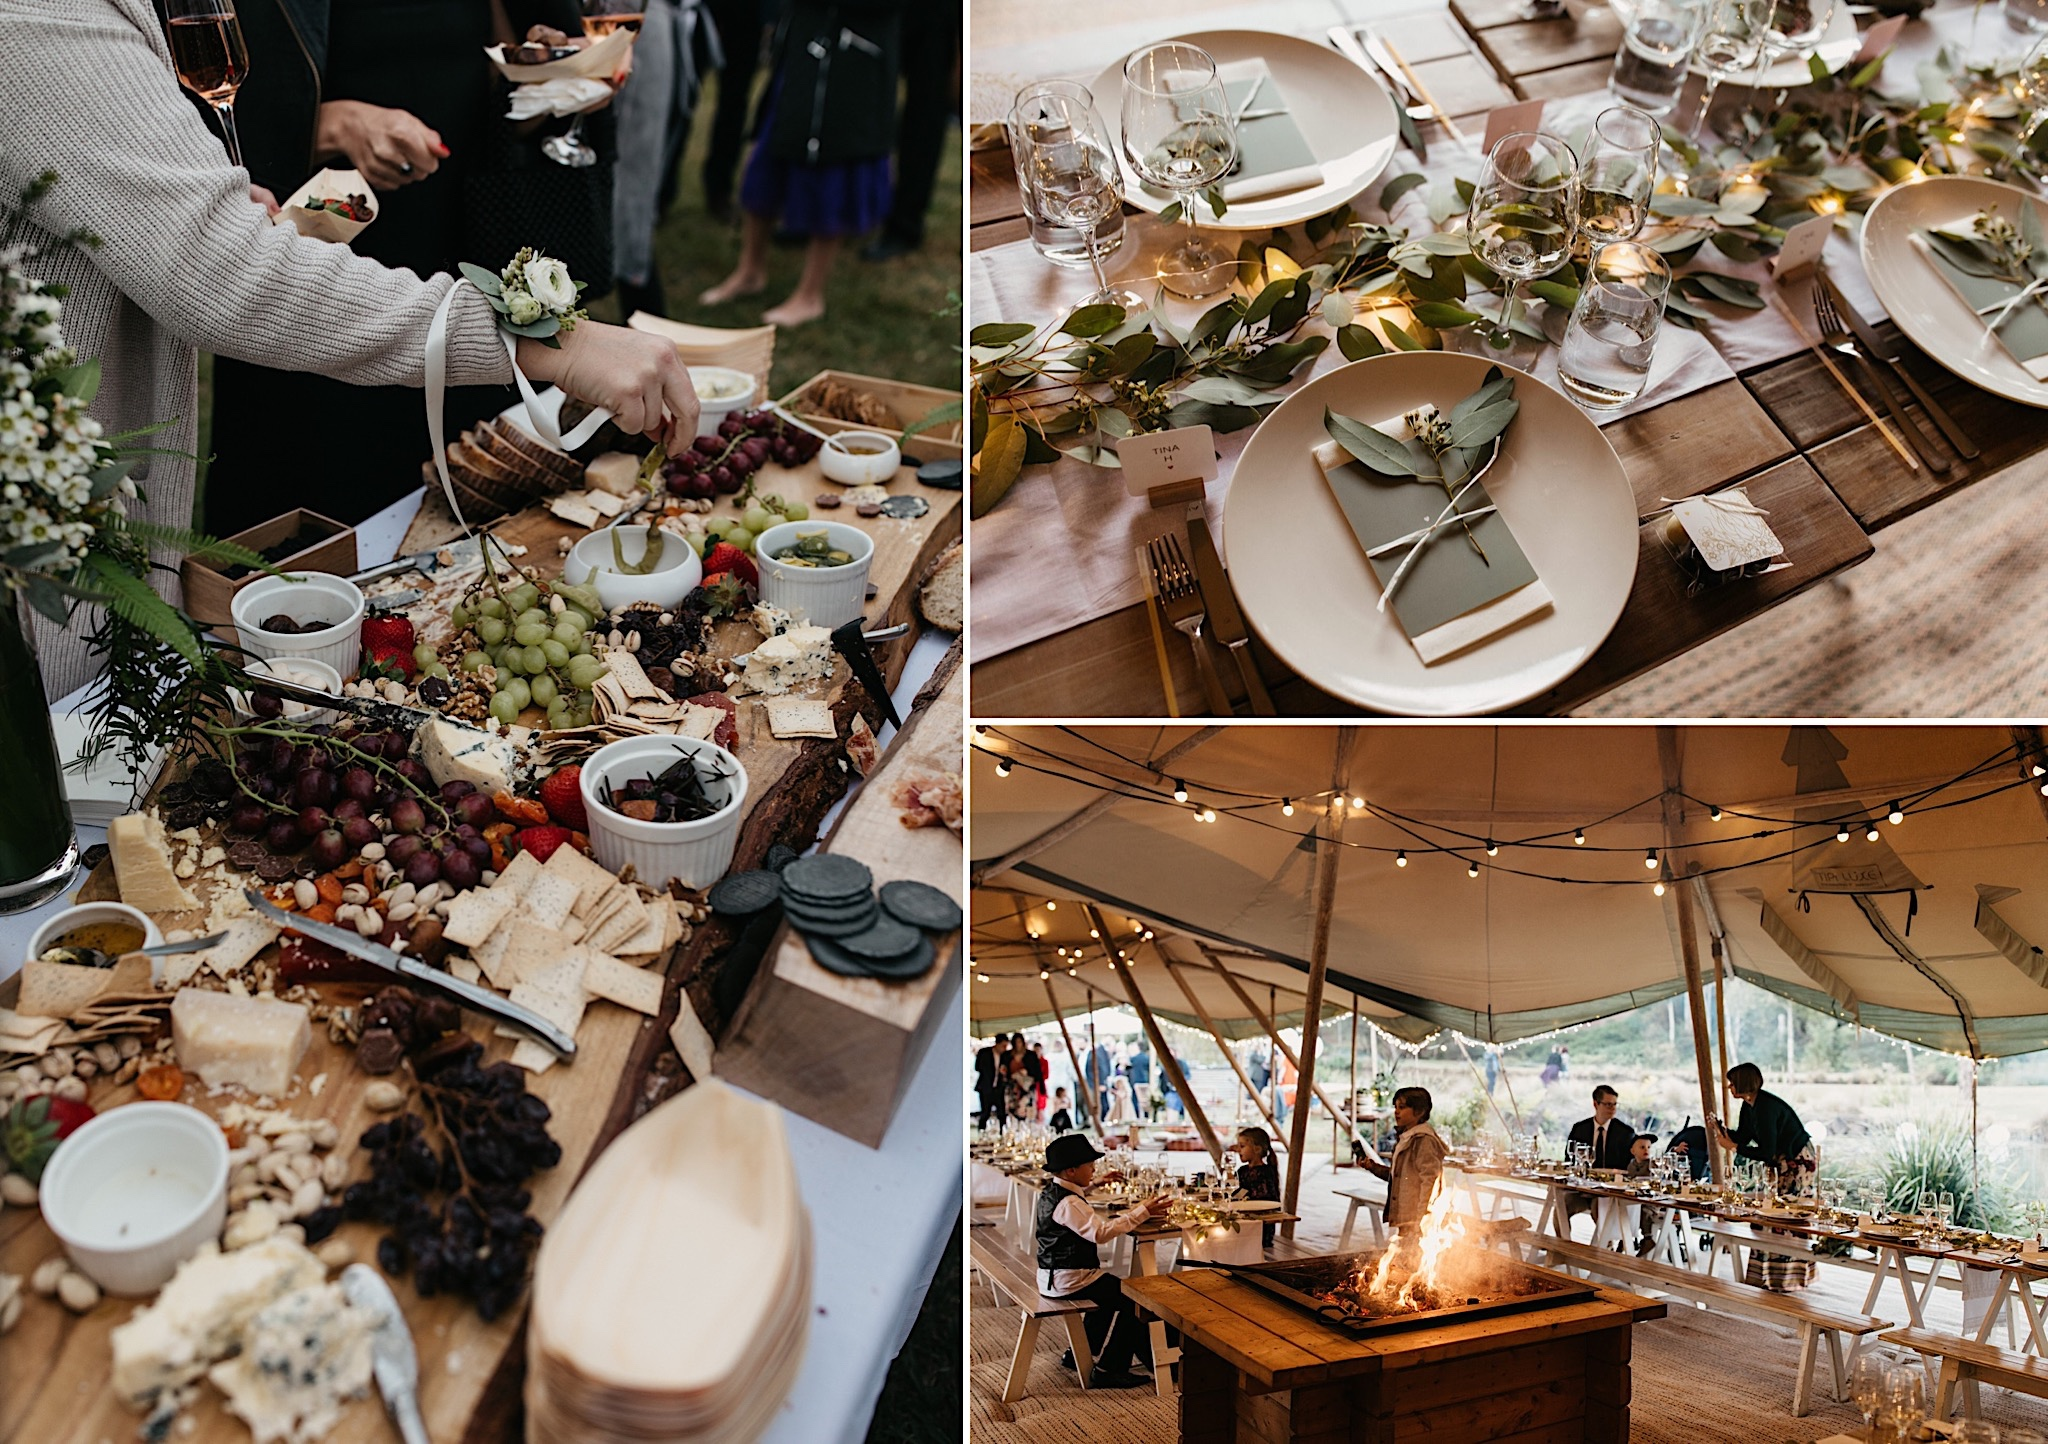 075_SBA-Jen-Tom-Wedding-328_SBA-Jen-Tom-Wedding-326_SBA-Jen-Tom-Wedding-275.jpg